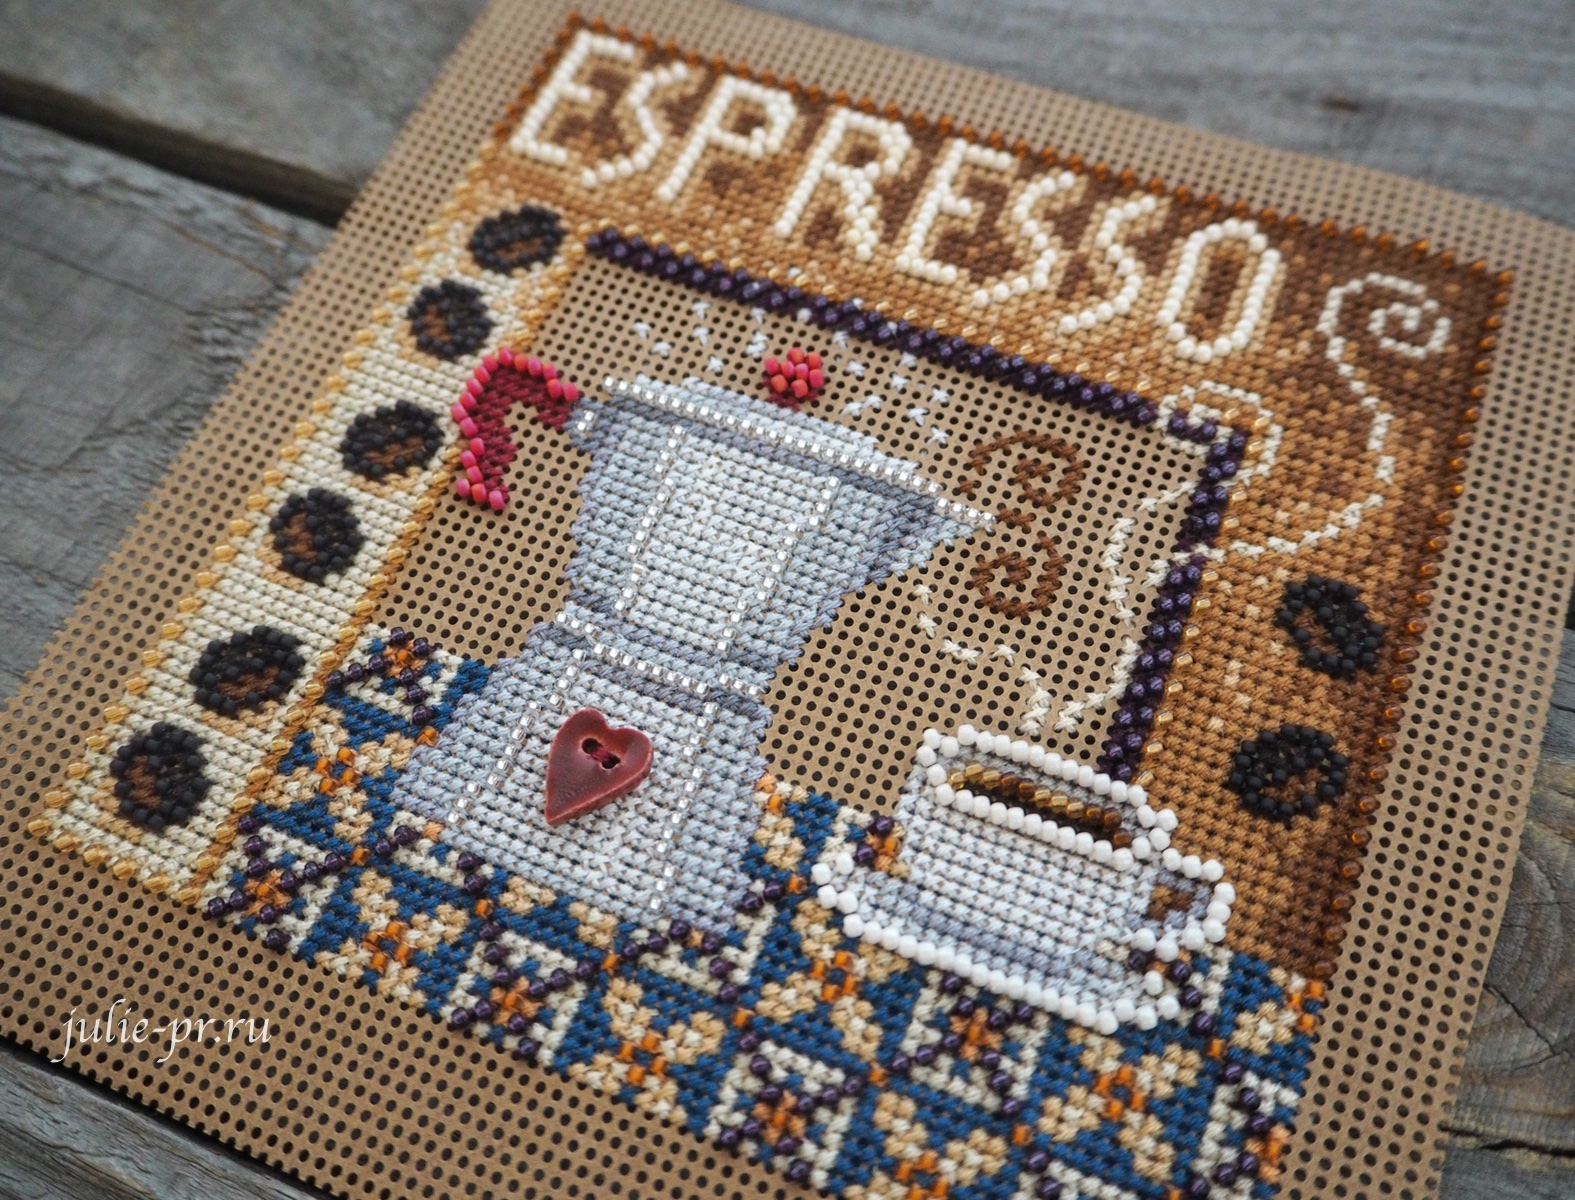 Mill Hill, вышивка крестом, вышивка бисером, coffee, кофе, кофейник, эспрессо, espresso, MH14-2024